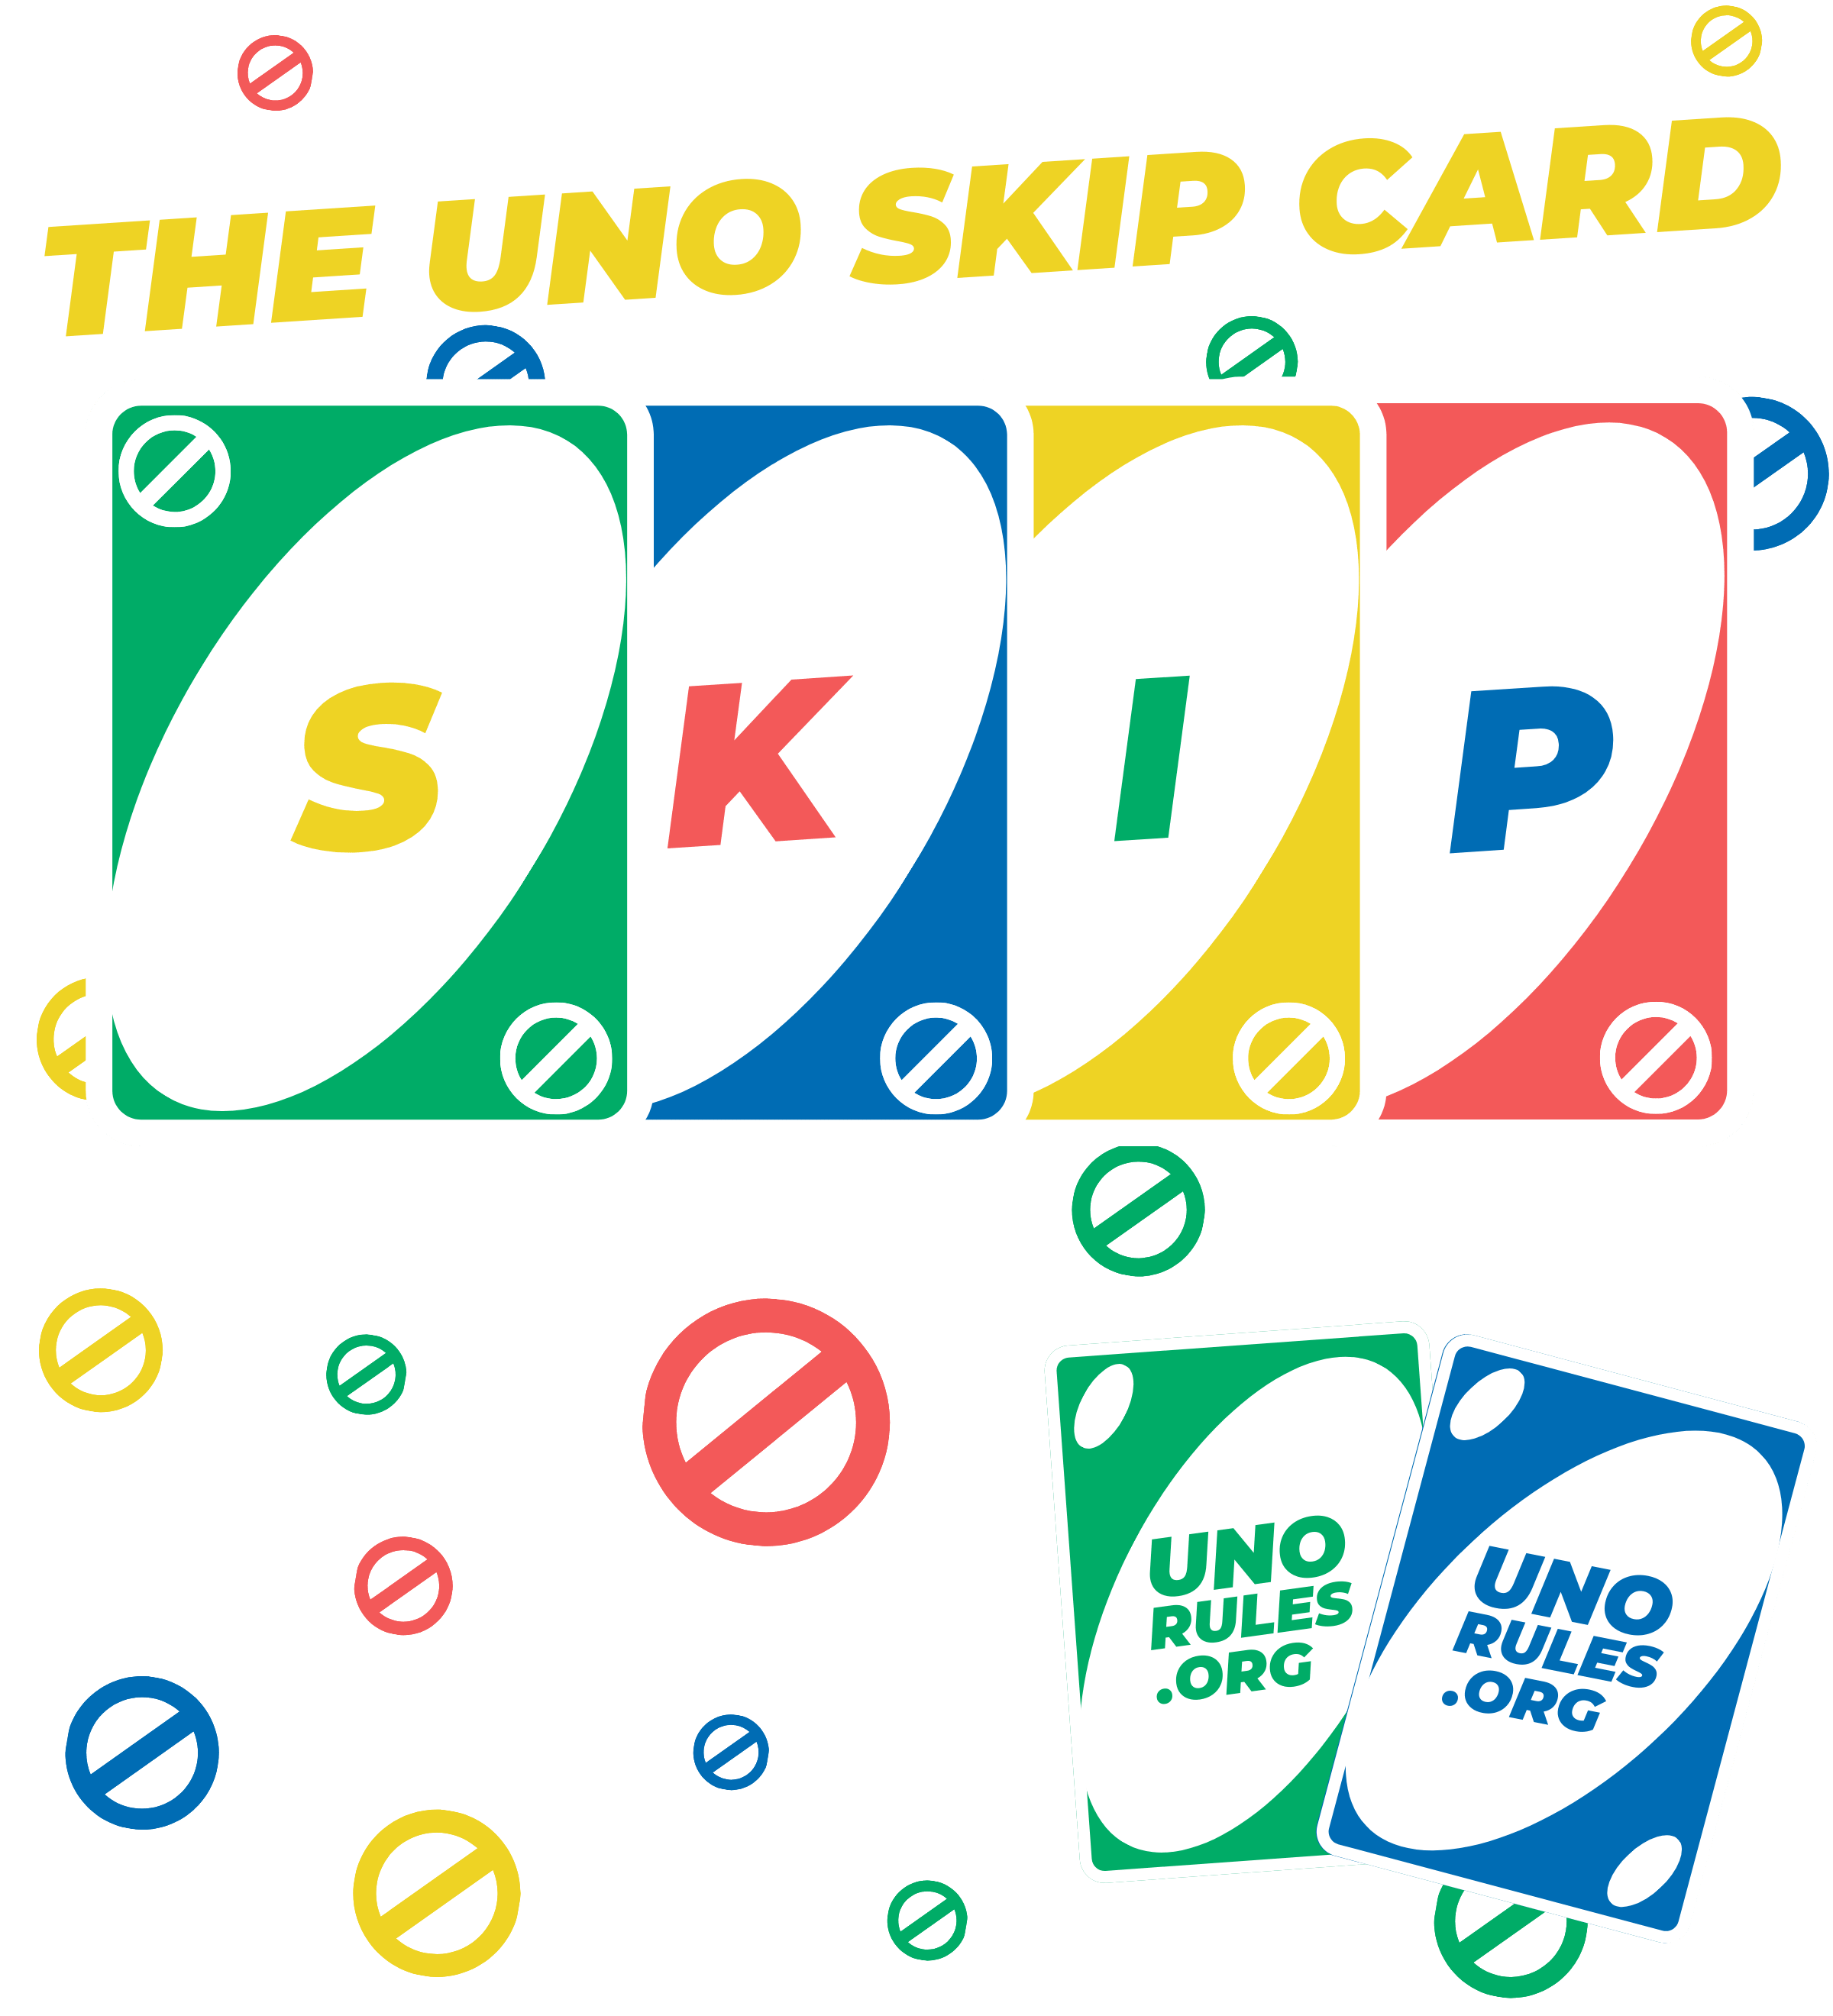 Uno Skip Card Unorules.org